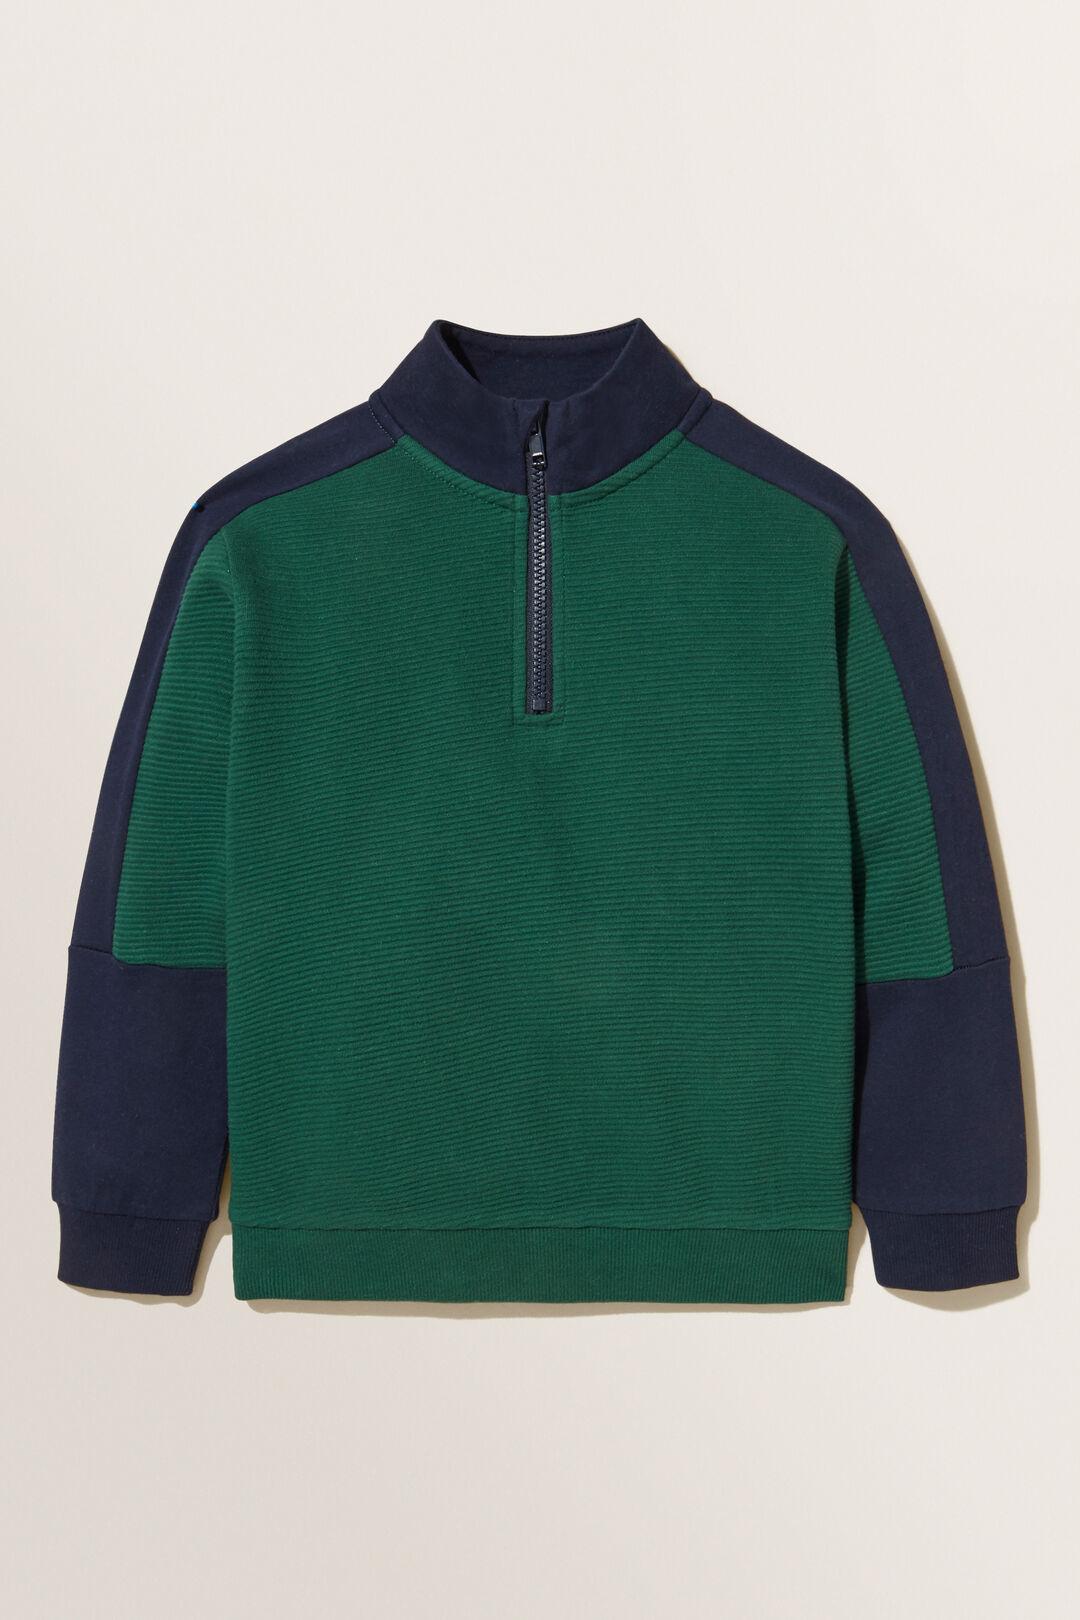 Panelled  Zip Sweater  BOTTLE GREEN  hi-res